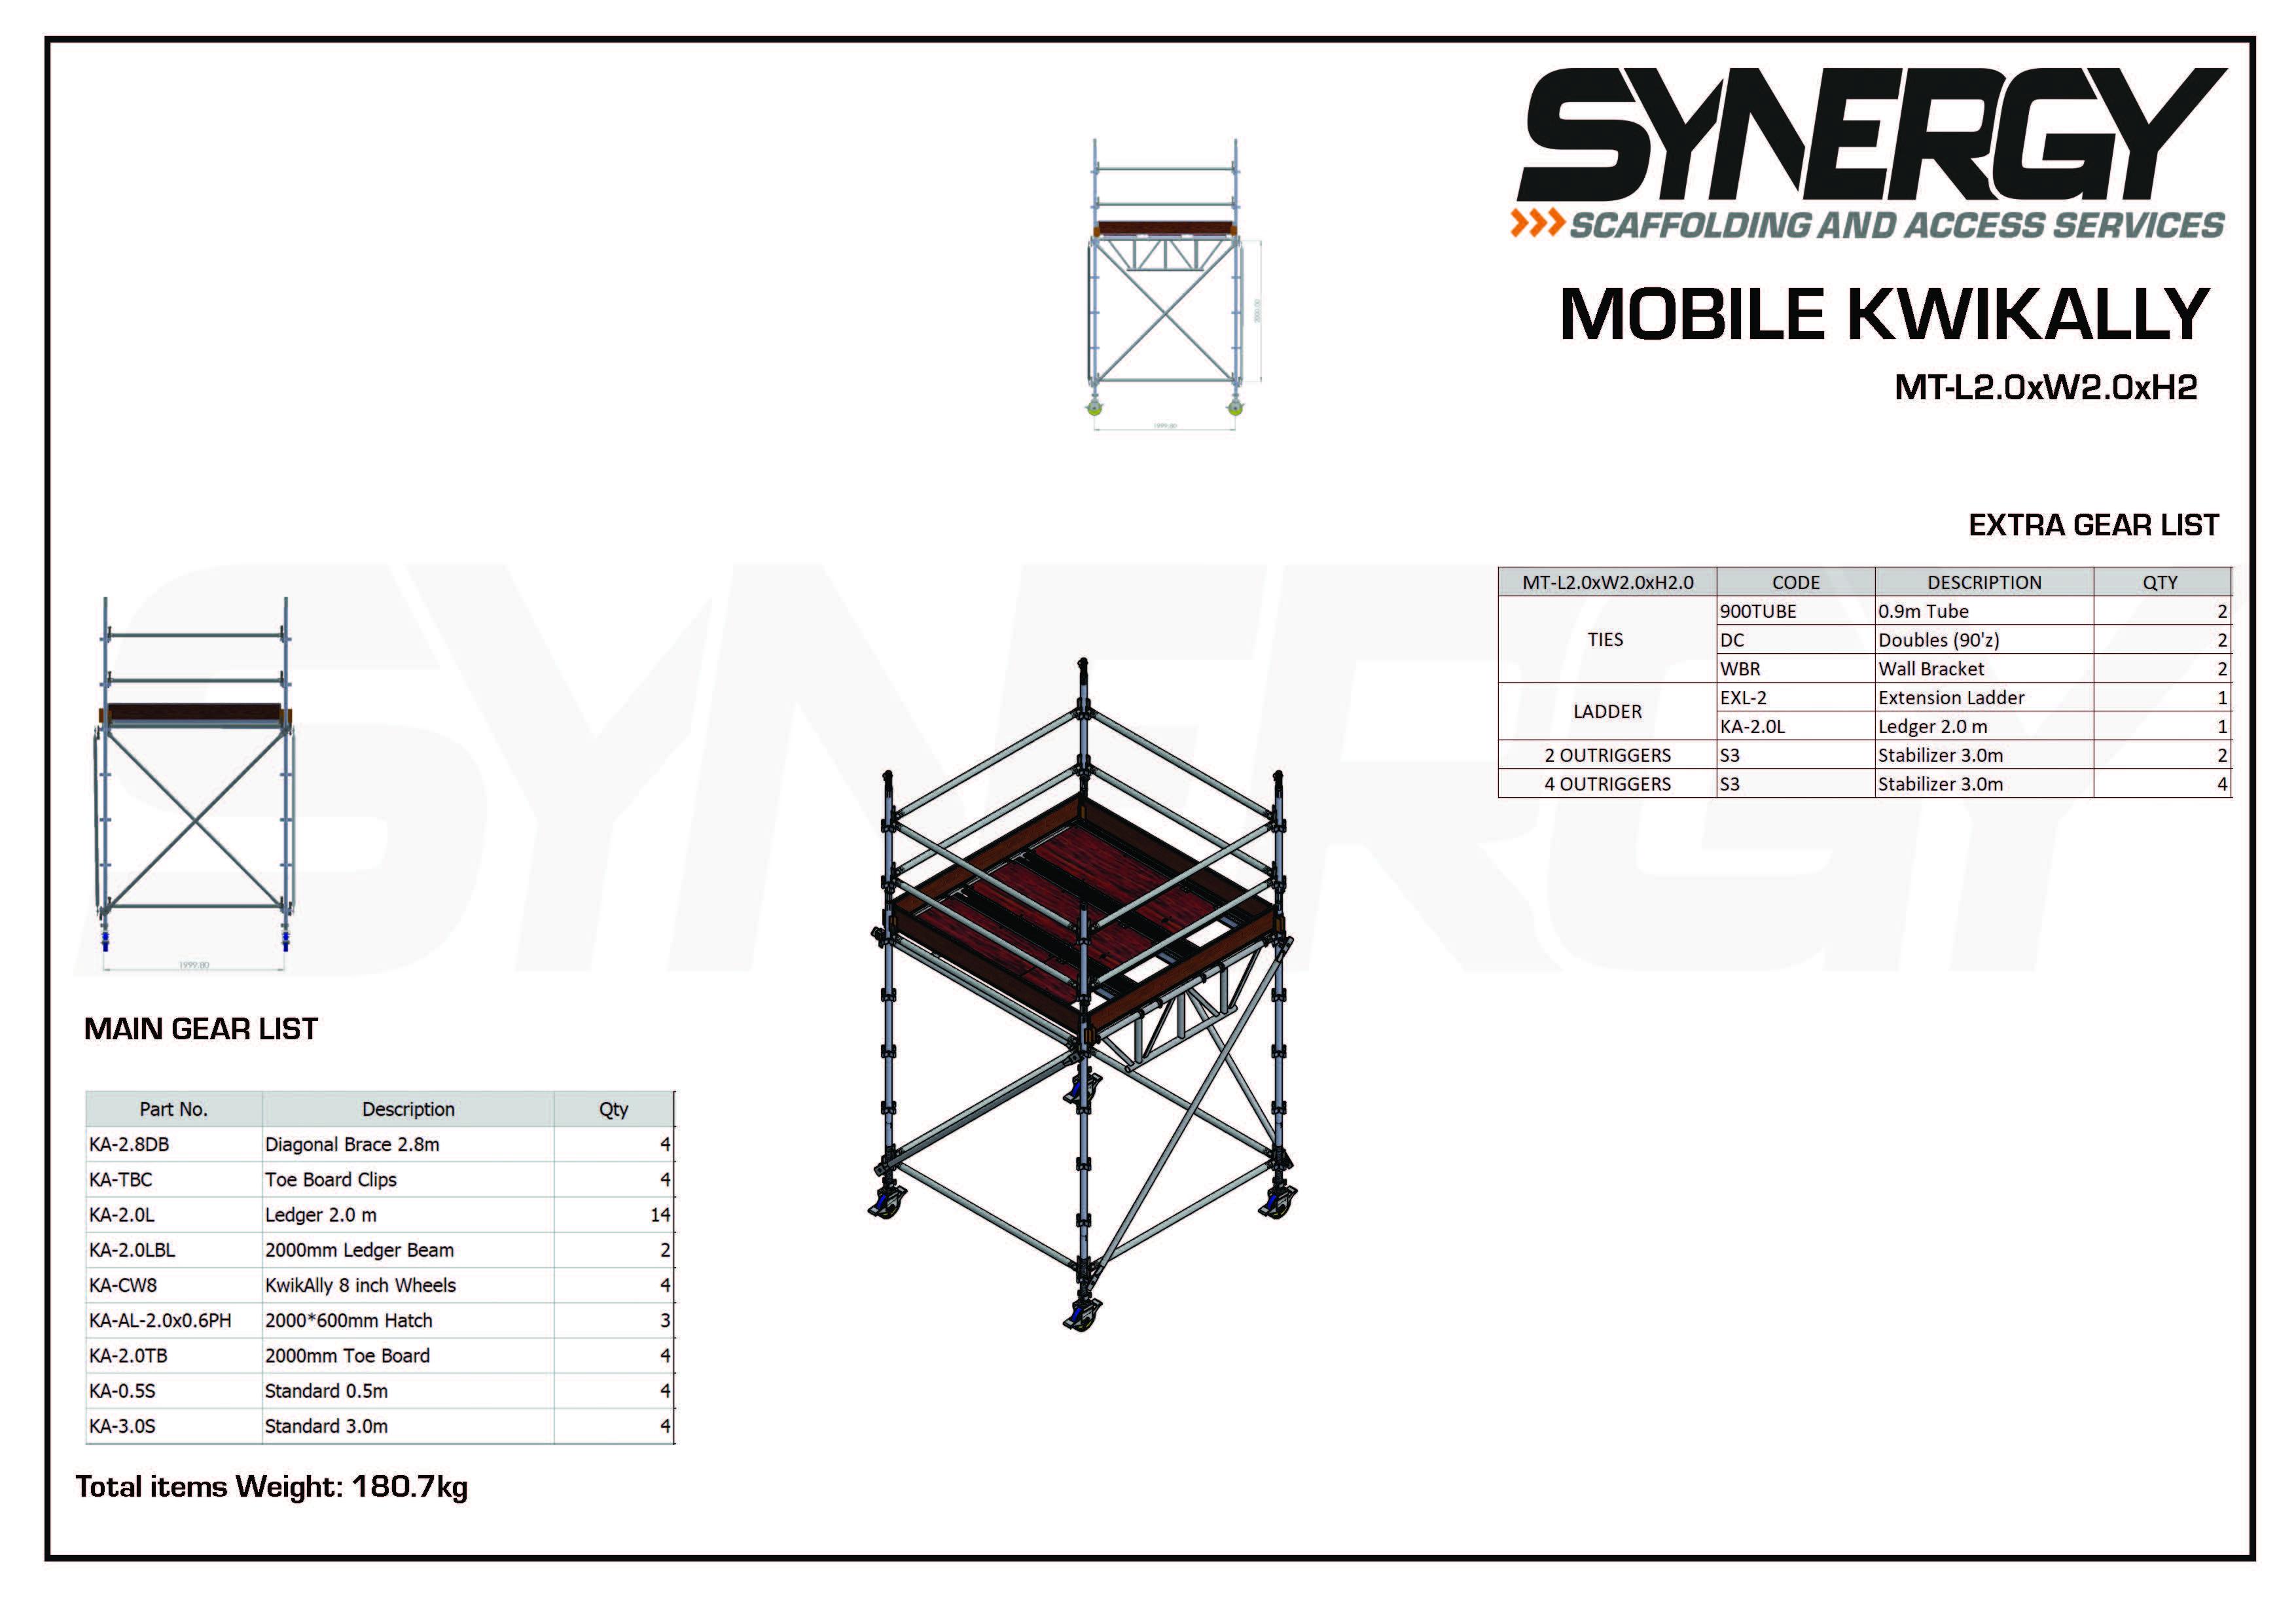 Kwikally Mobile 2.0m x 2.0m x 2m(Height)